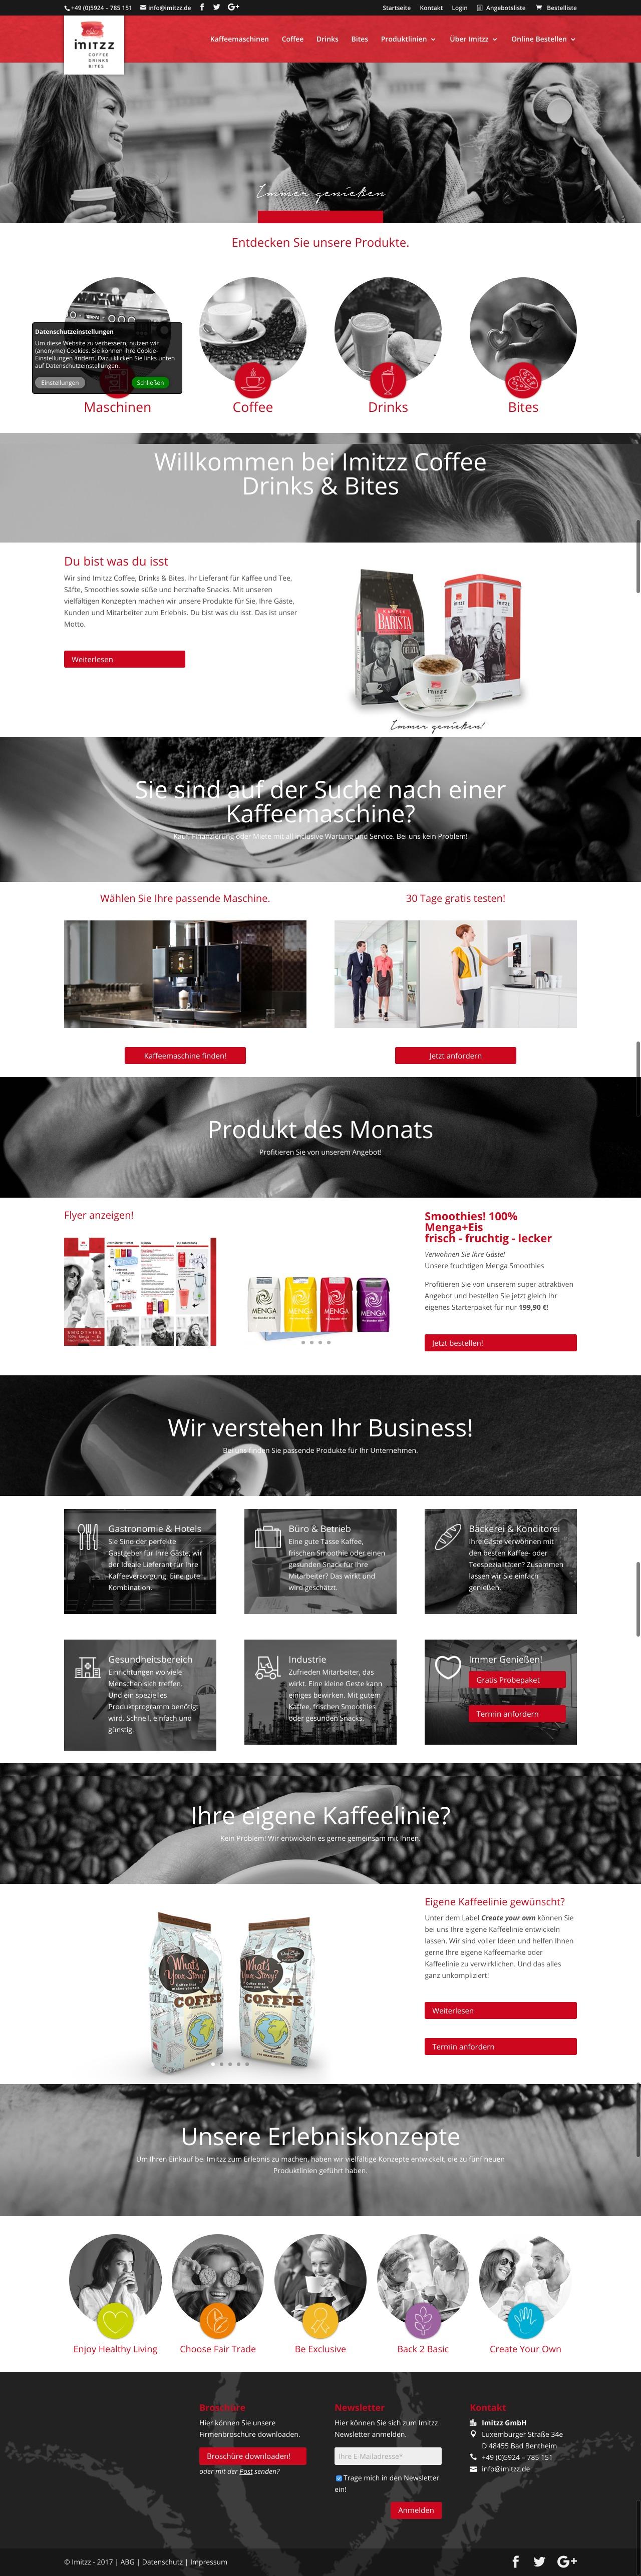 Imitzz Coffee Drinks & Bites   Divi WordPress Theme Inspiration ...